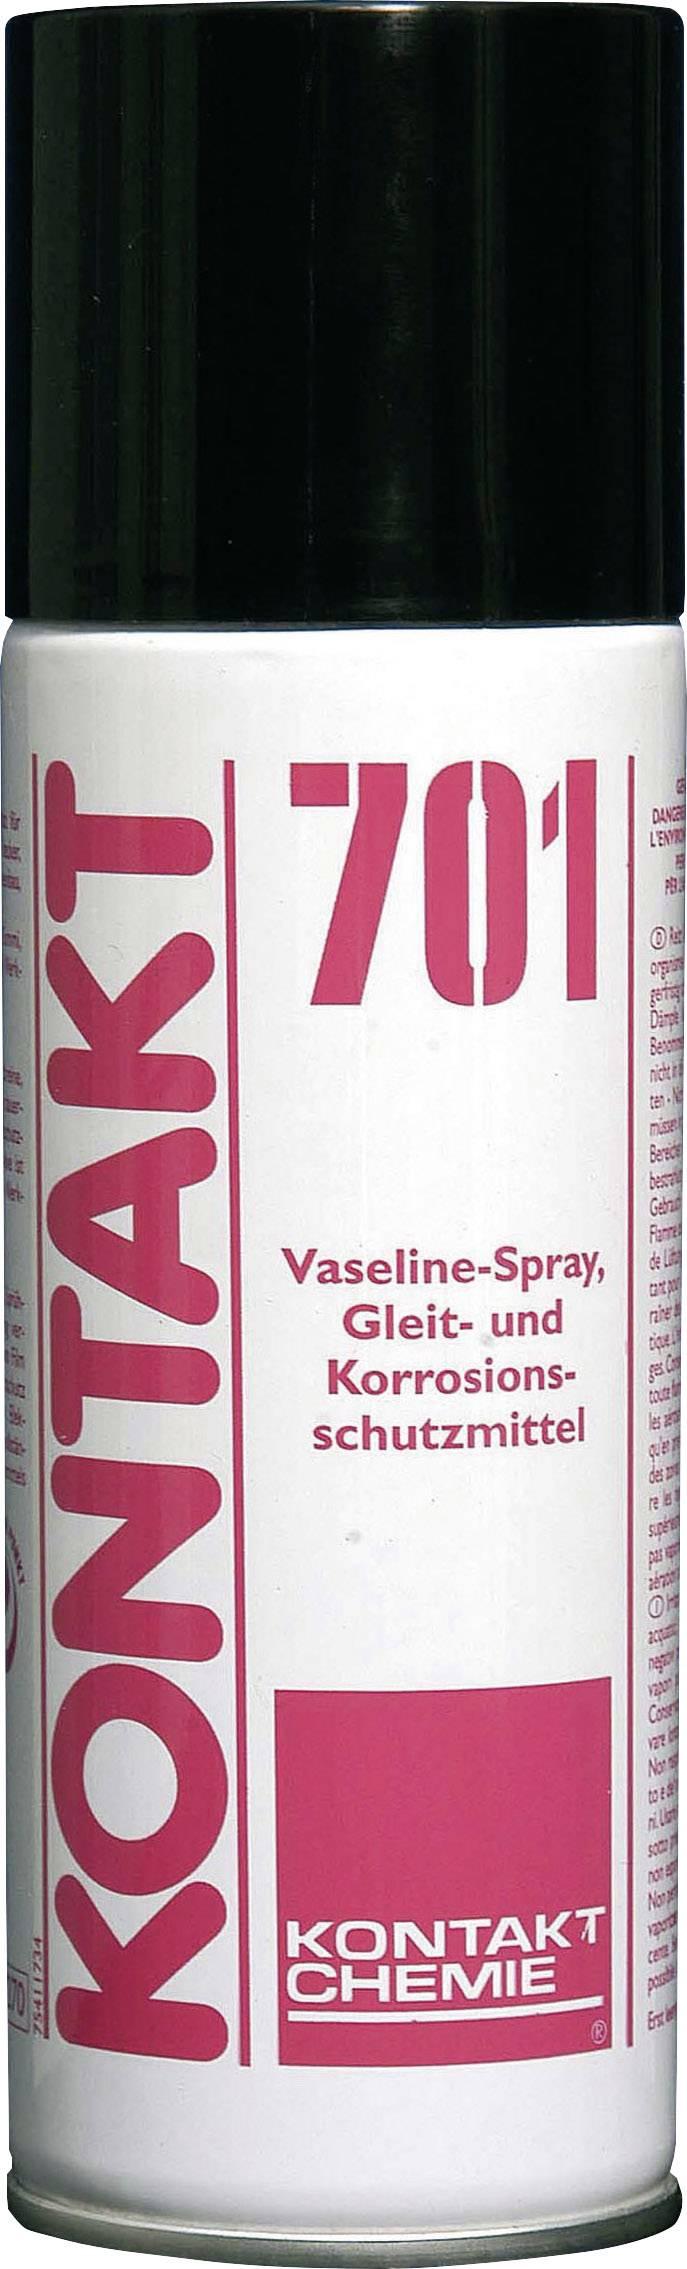 Mazací sprej CRC Kontakt Chemie Kontakt 701 83509-AG 200 ml